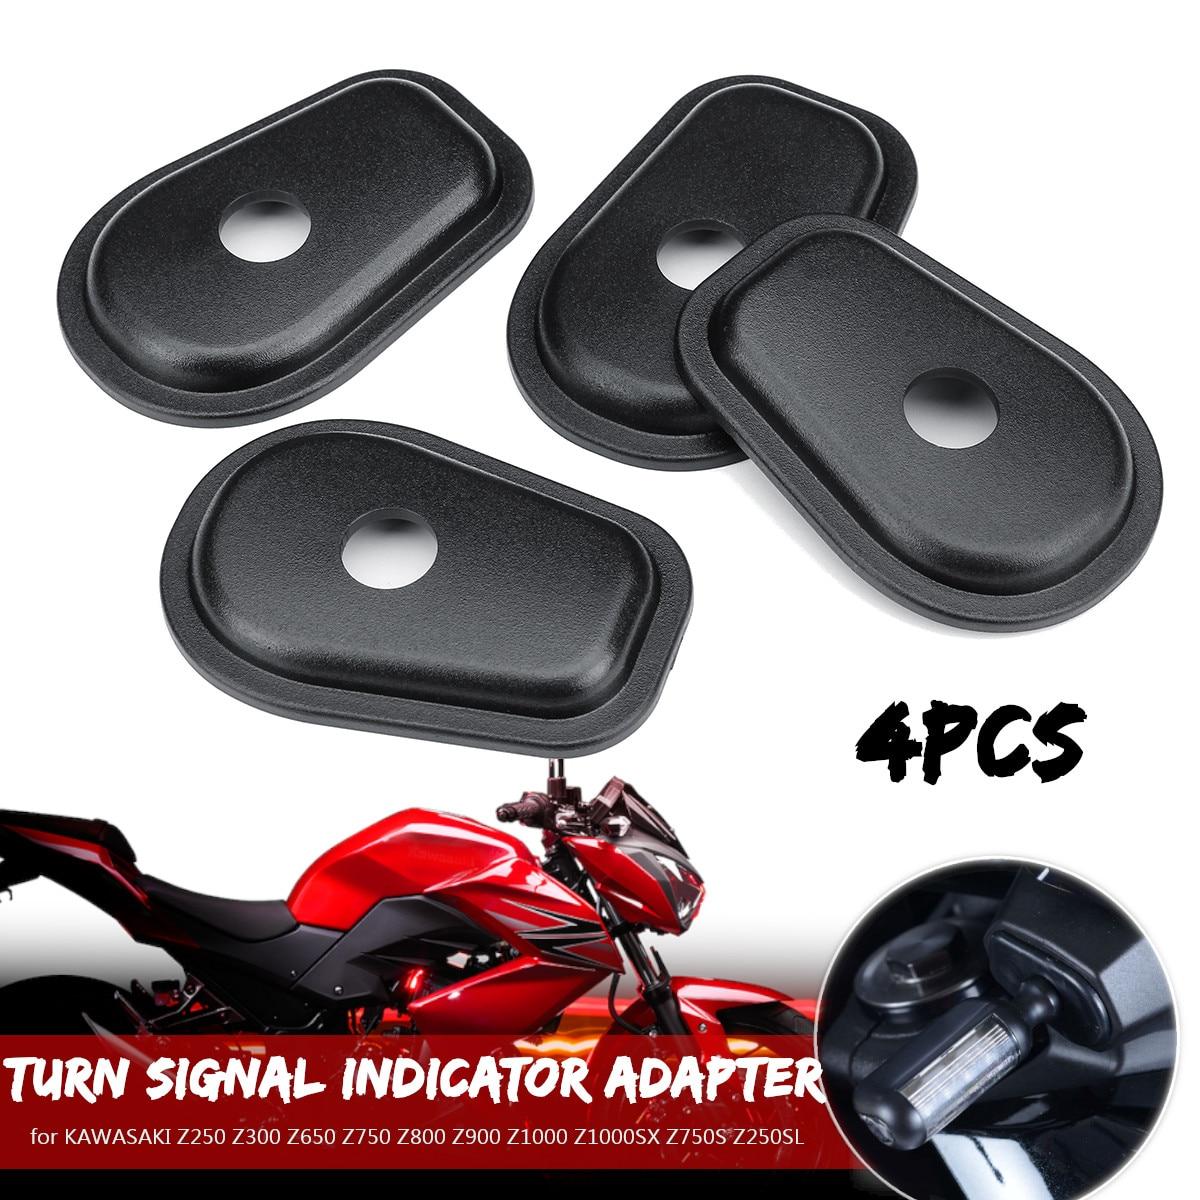 4pcs Motorcycle Turn Signal Indicator Adapter Spacers for KAWASAKI Z250 Z300 Z650 Z750 Z800 Z900 Z1000 Z1000SX Z750S Z250SL